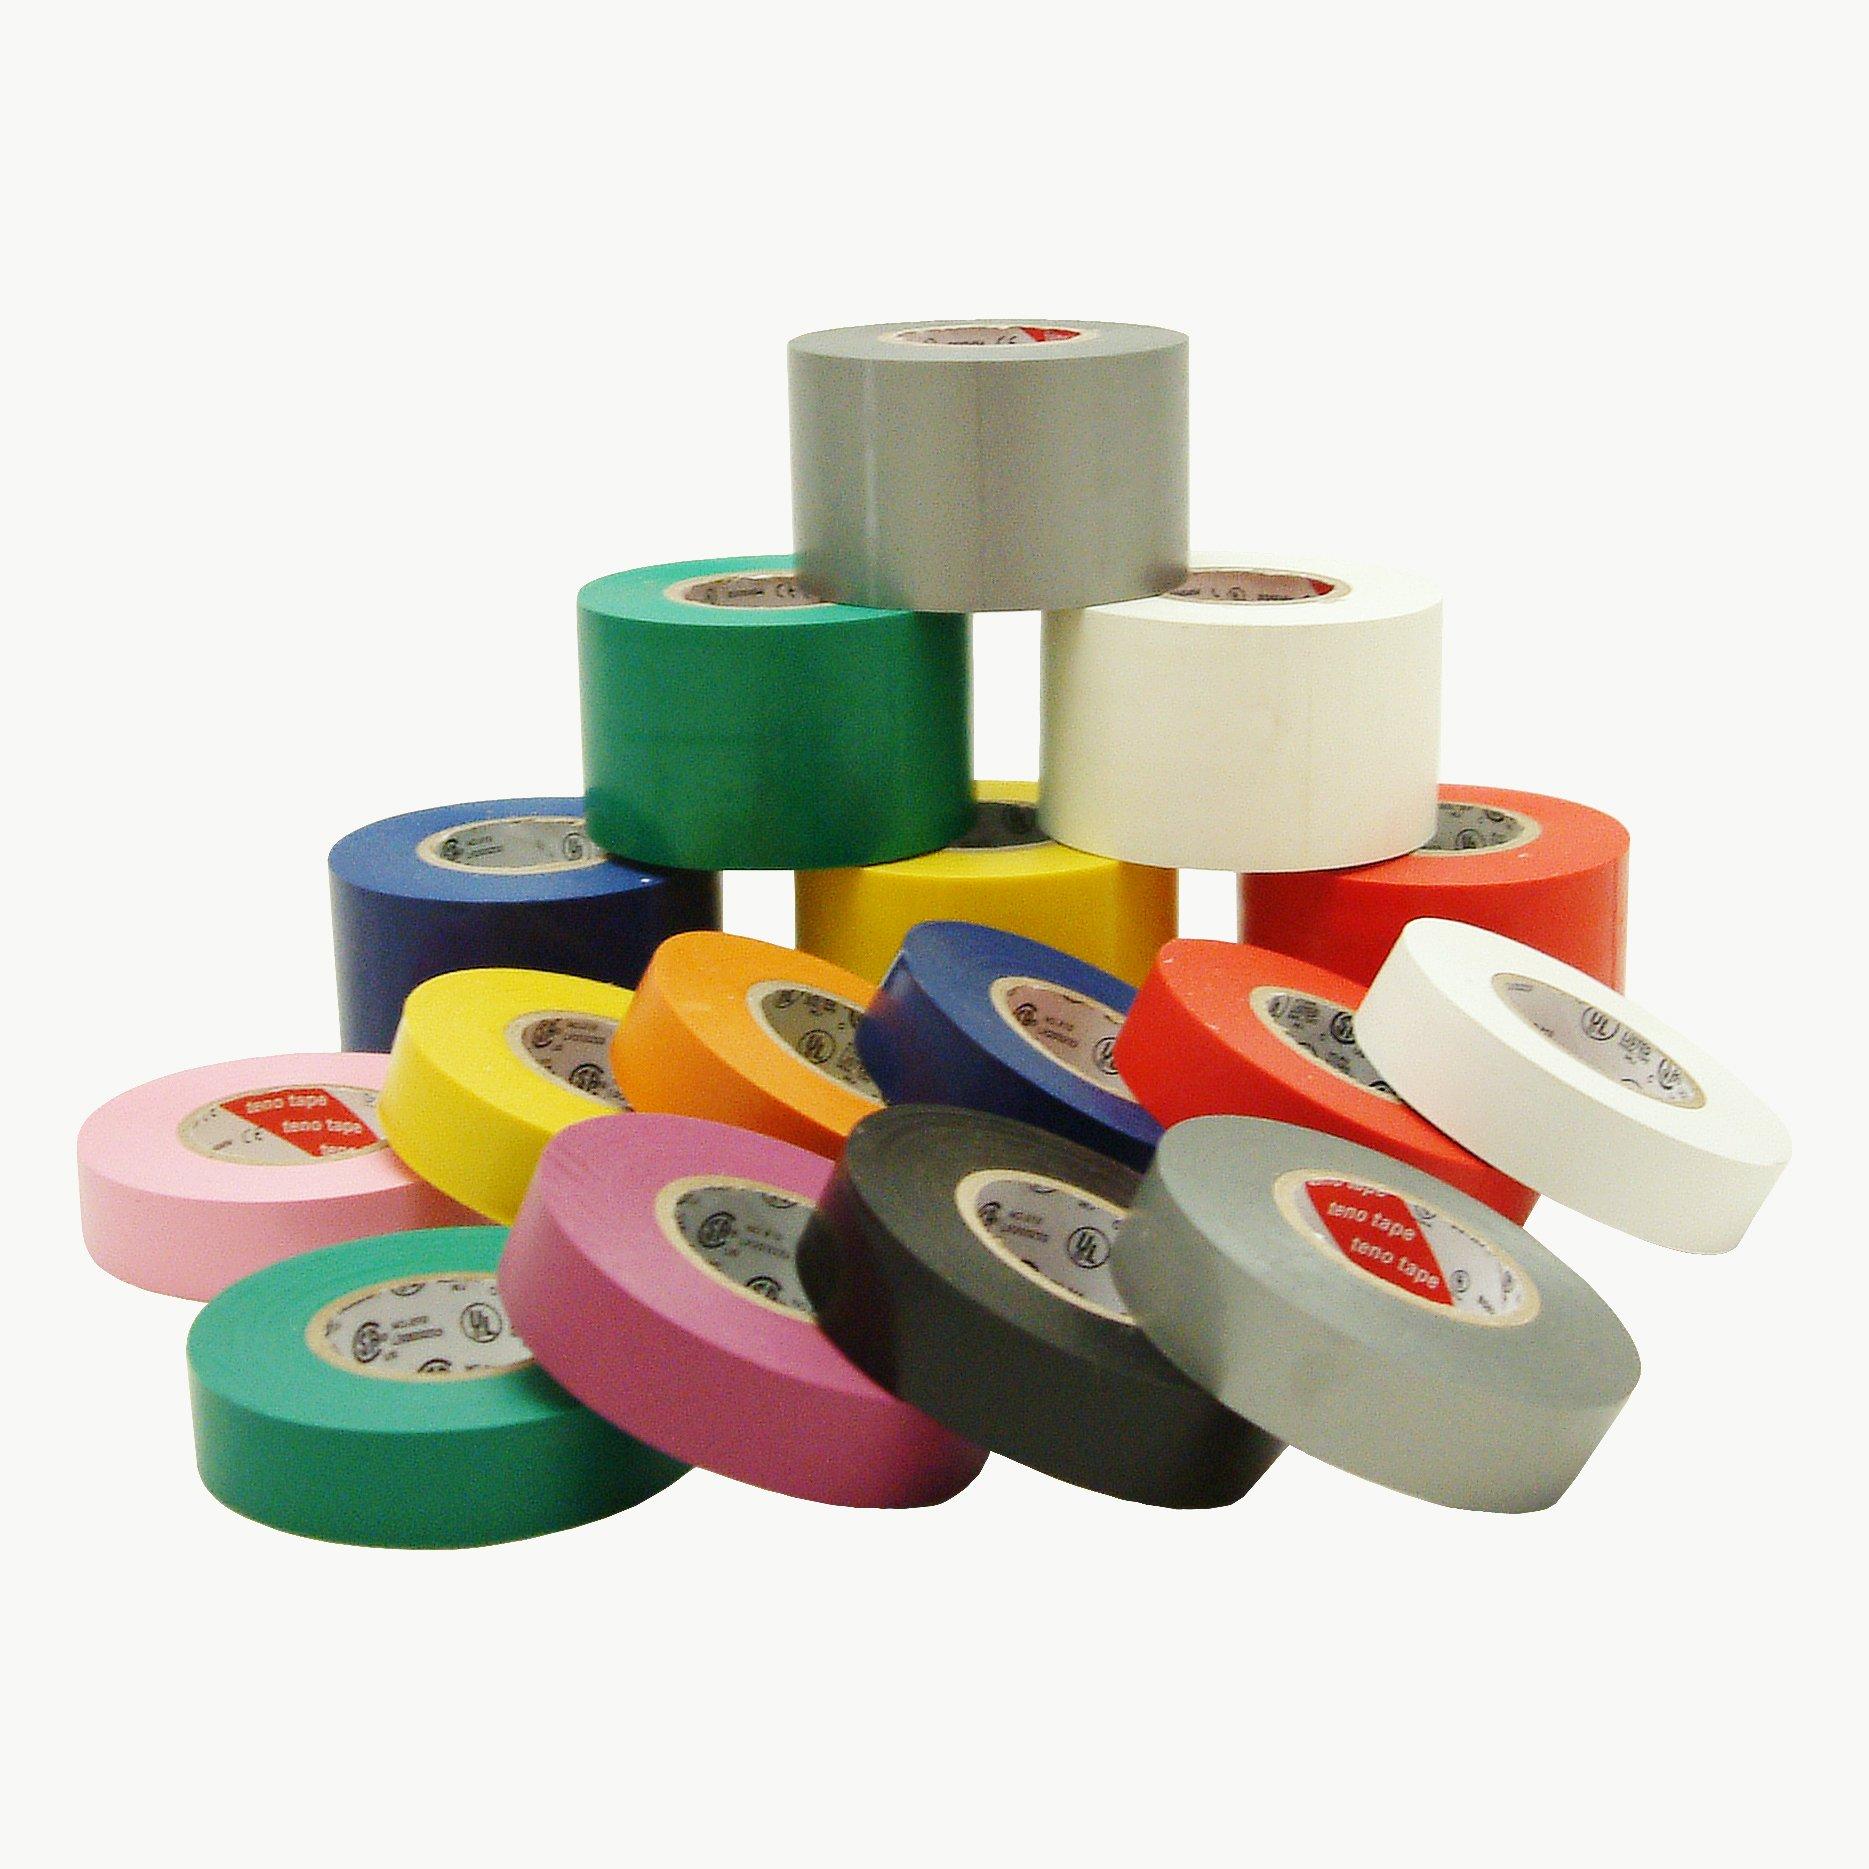 J.V. Converting E-TAPE/PI07522 JVCC E-Tape Colored Electrical Tape, 66' Length x 3/4'' Width, Pink